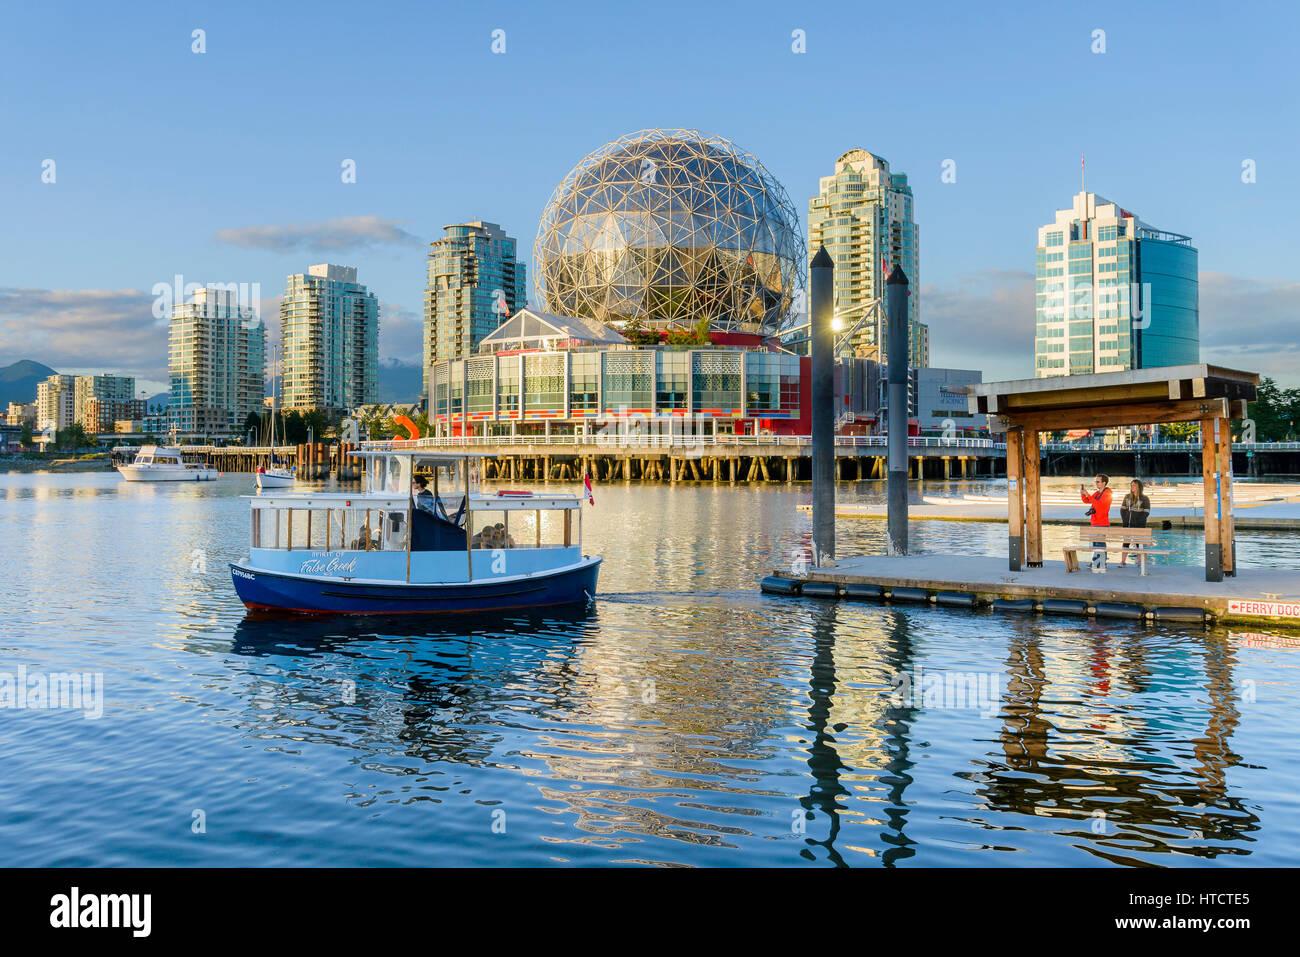 Muelle de Transbordadores, a False Creek de Vancouver, British Columbia, Canadá Foto de stock